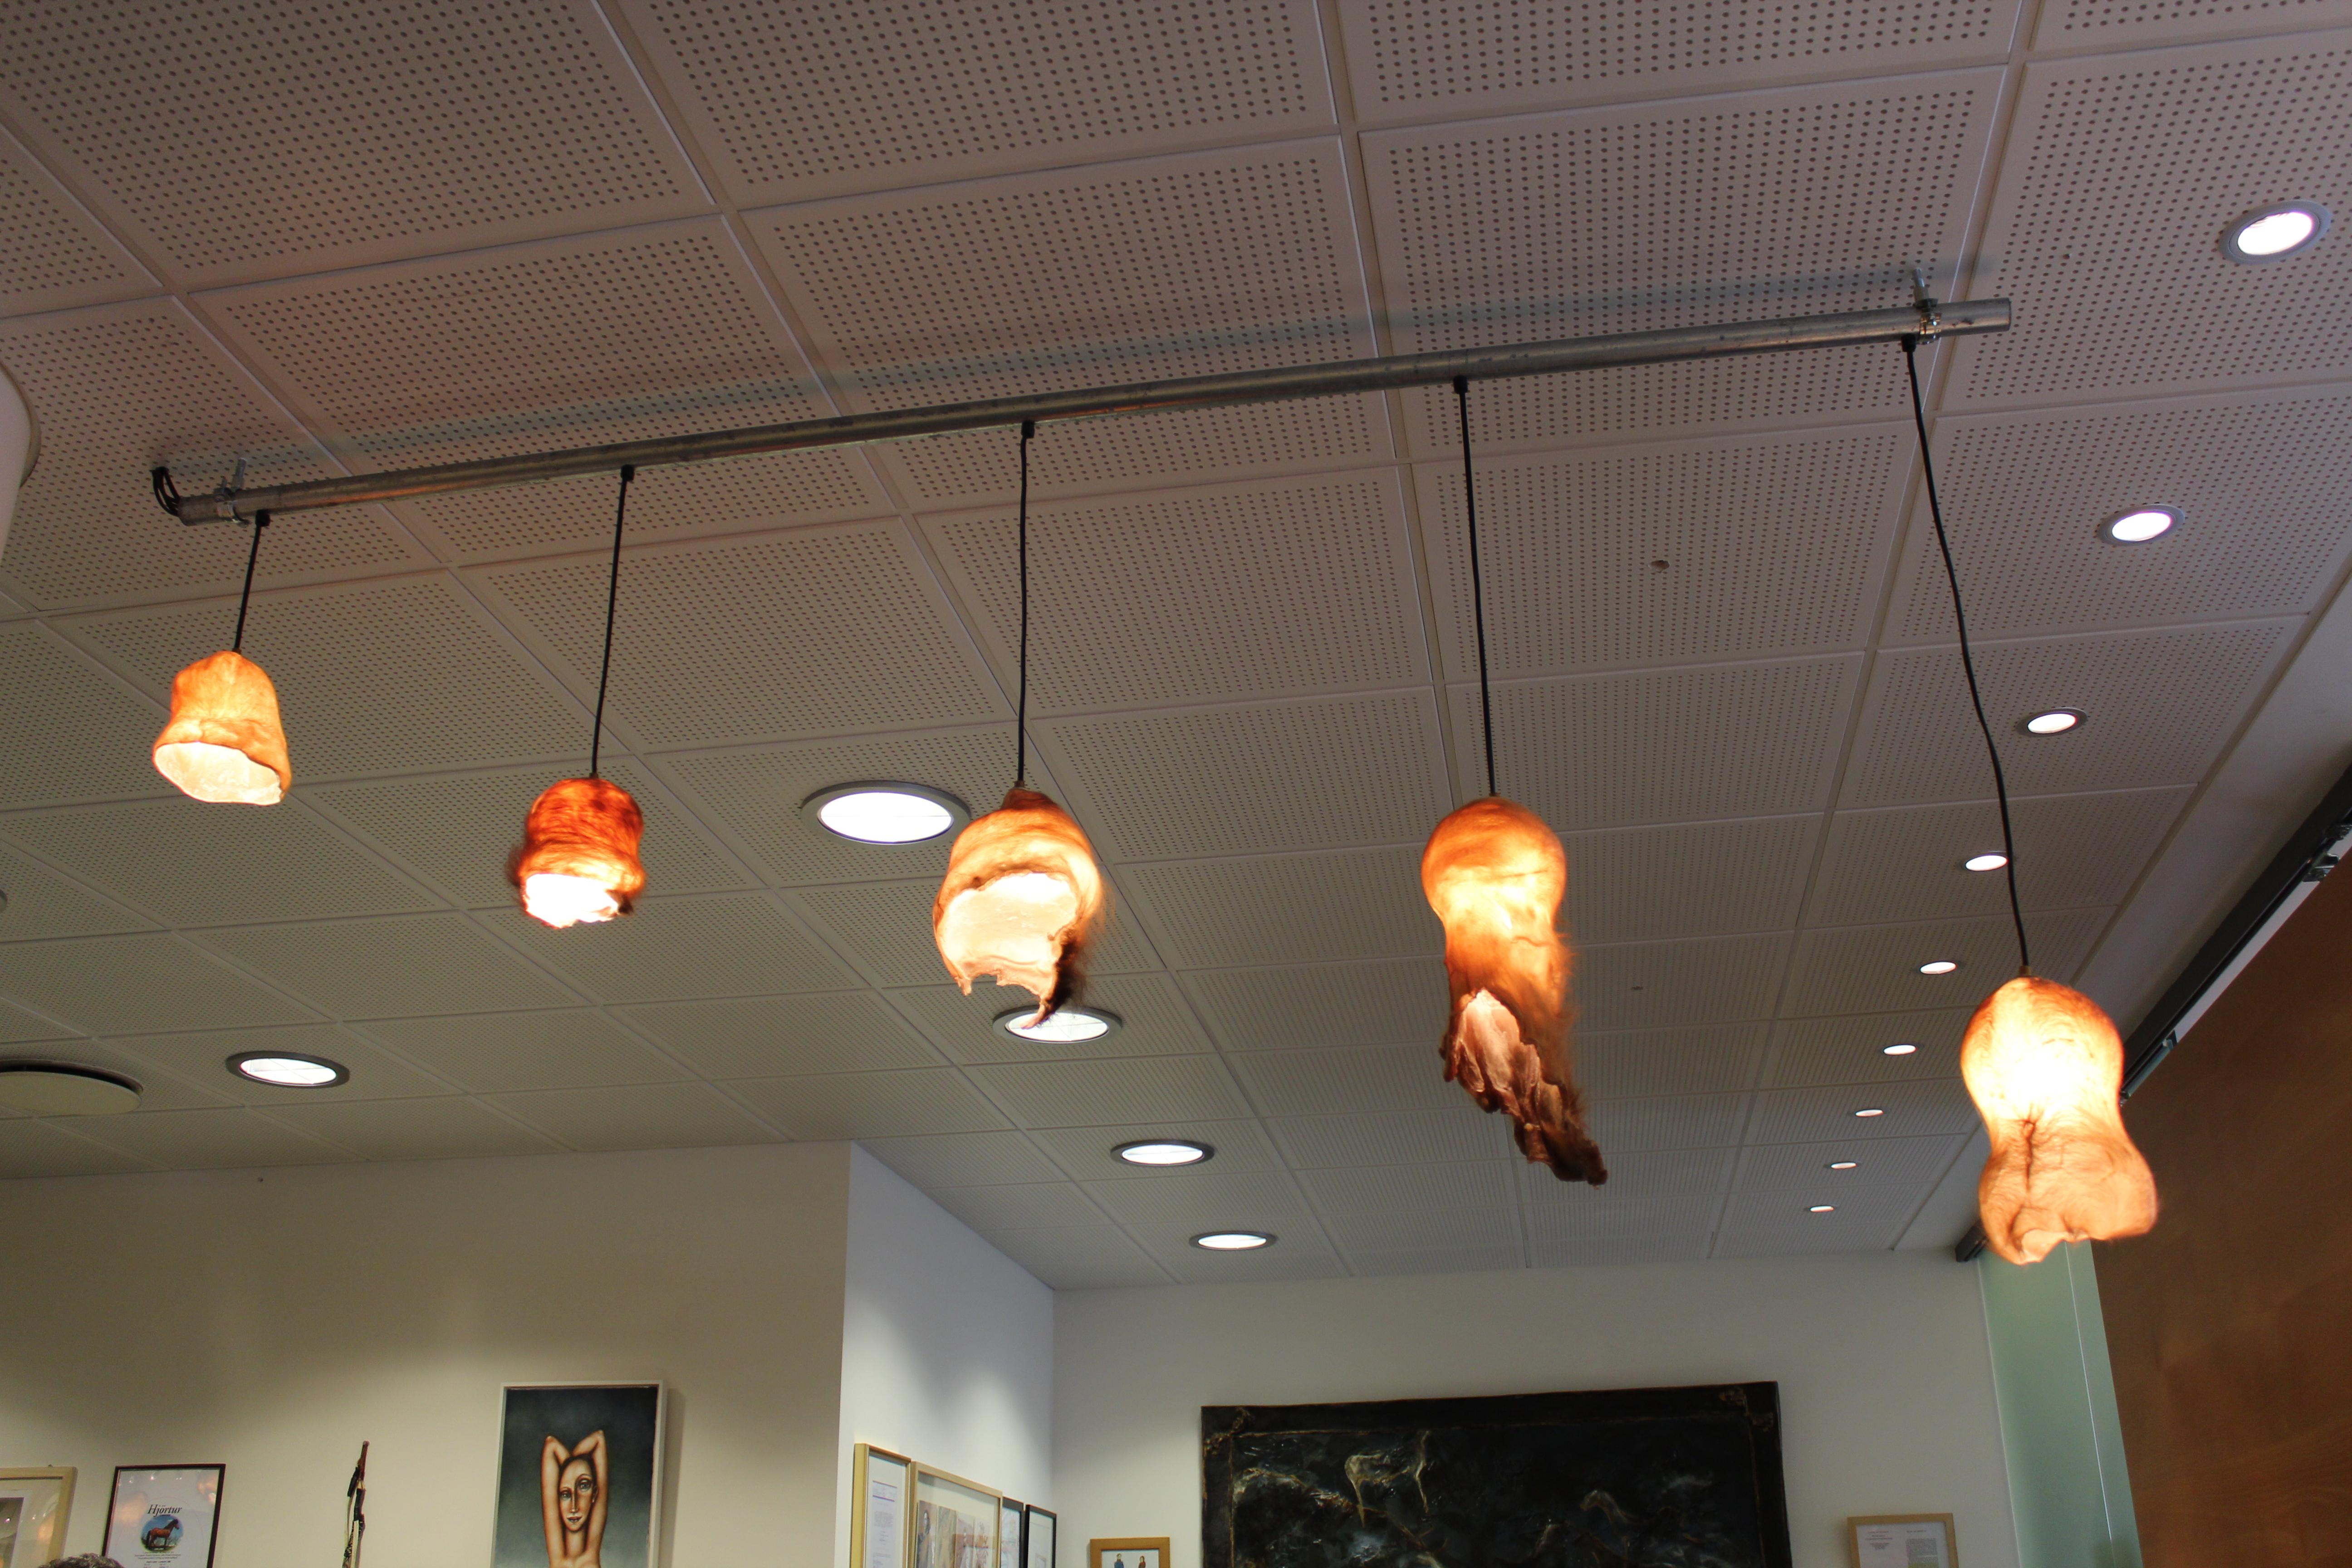 Bull scrotum lampshades.